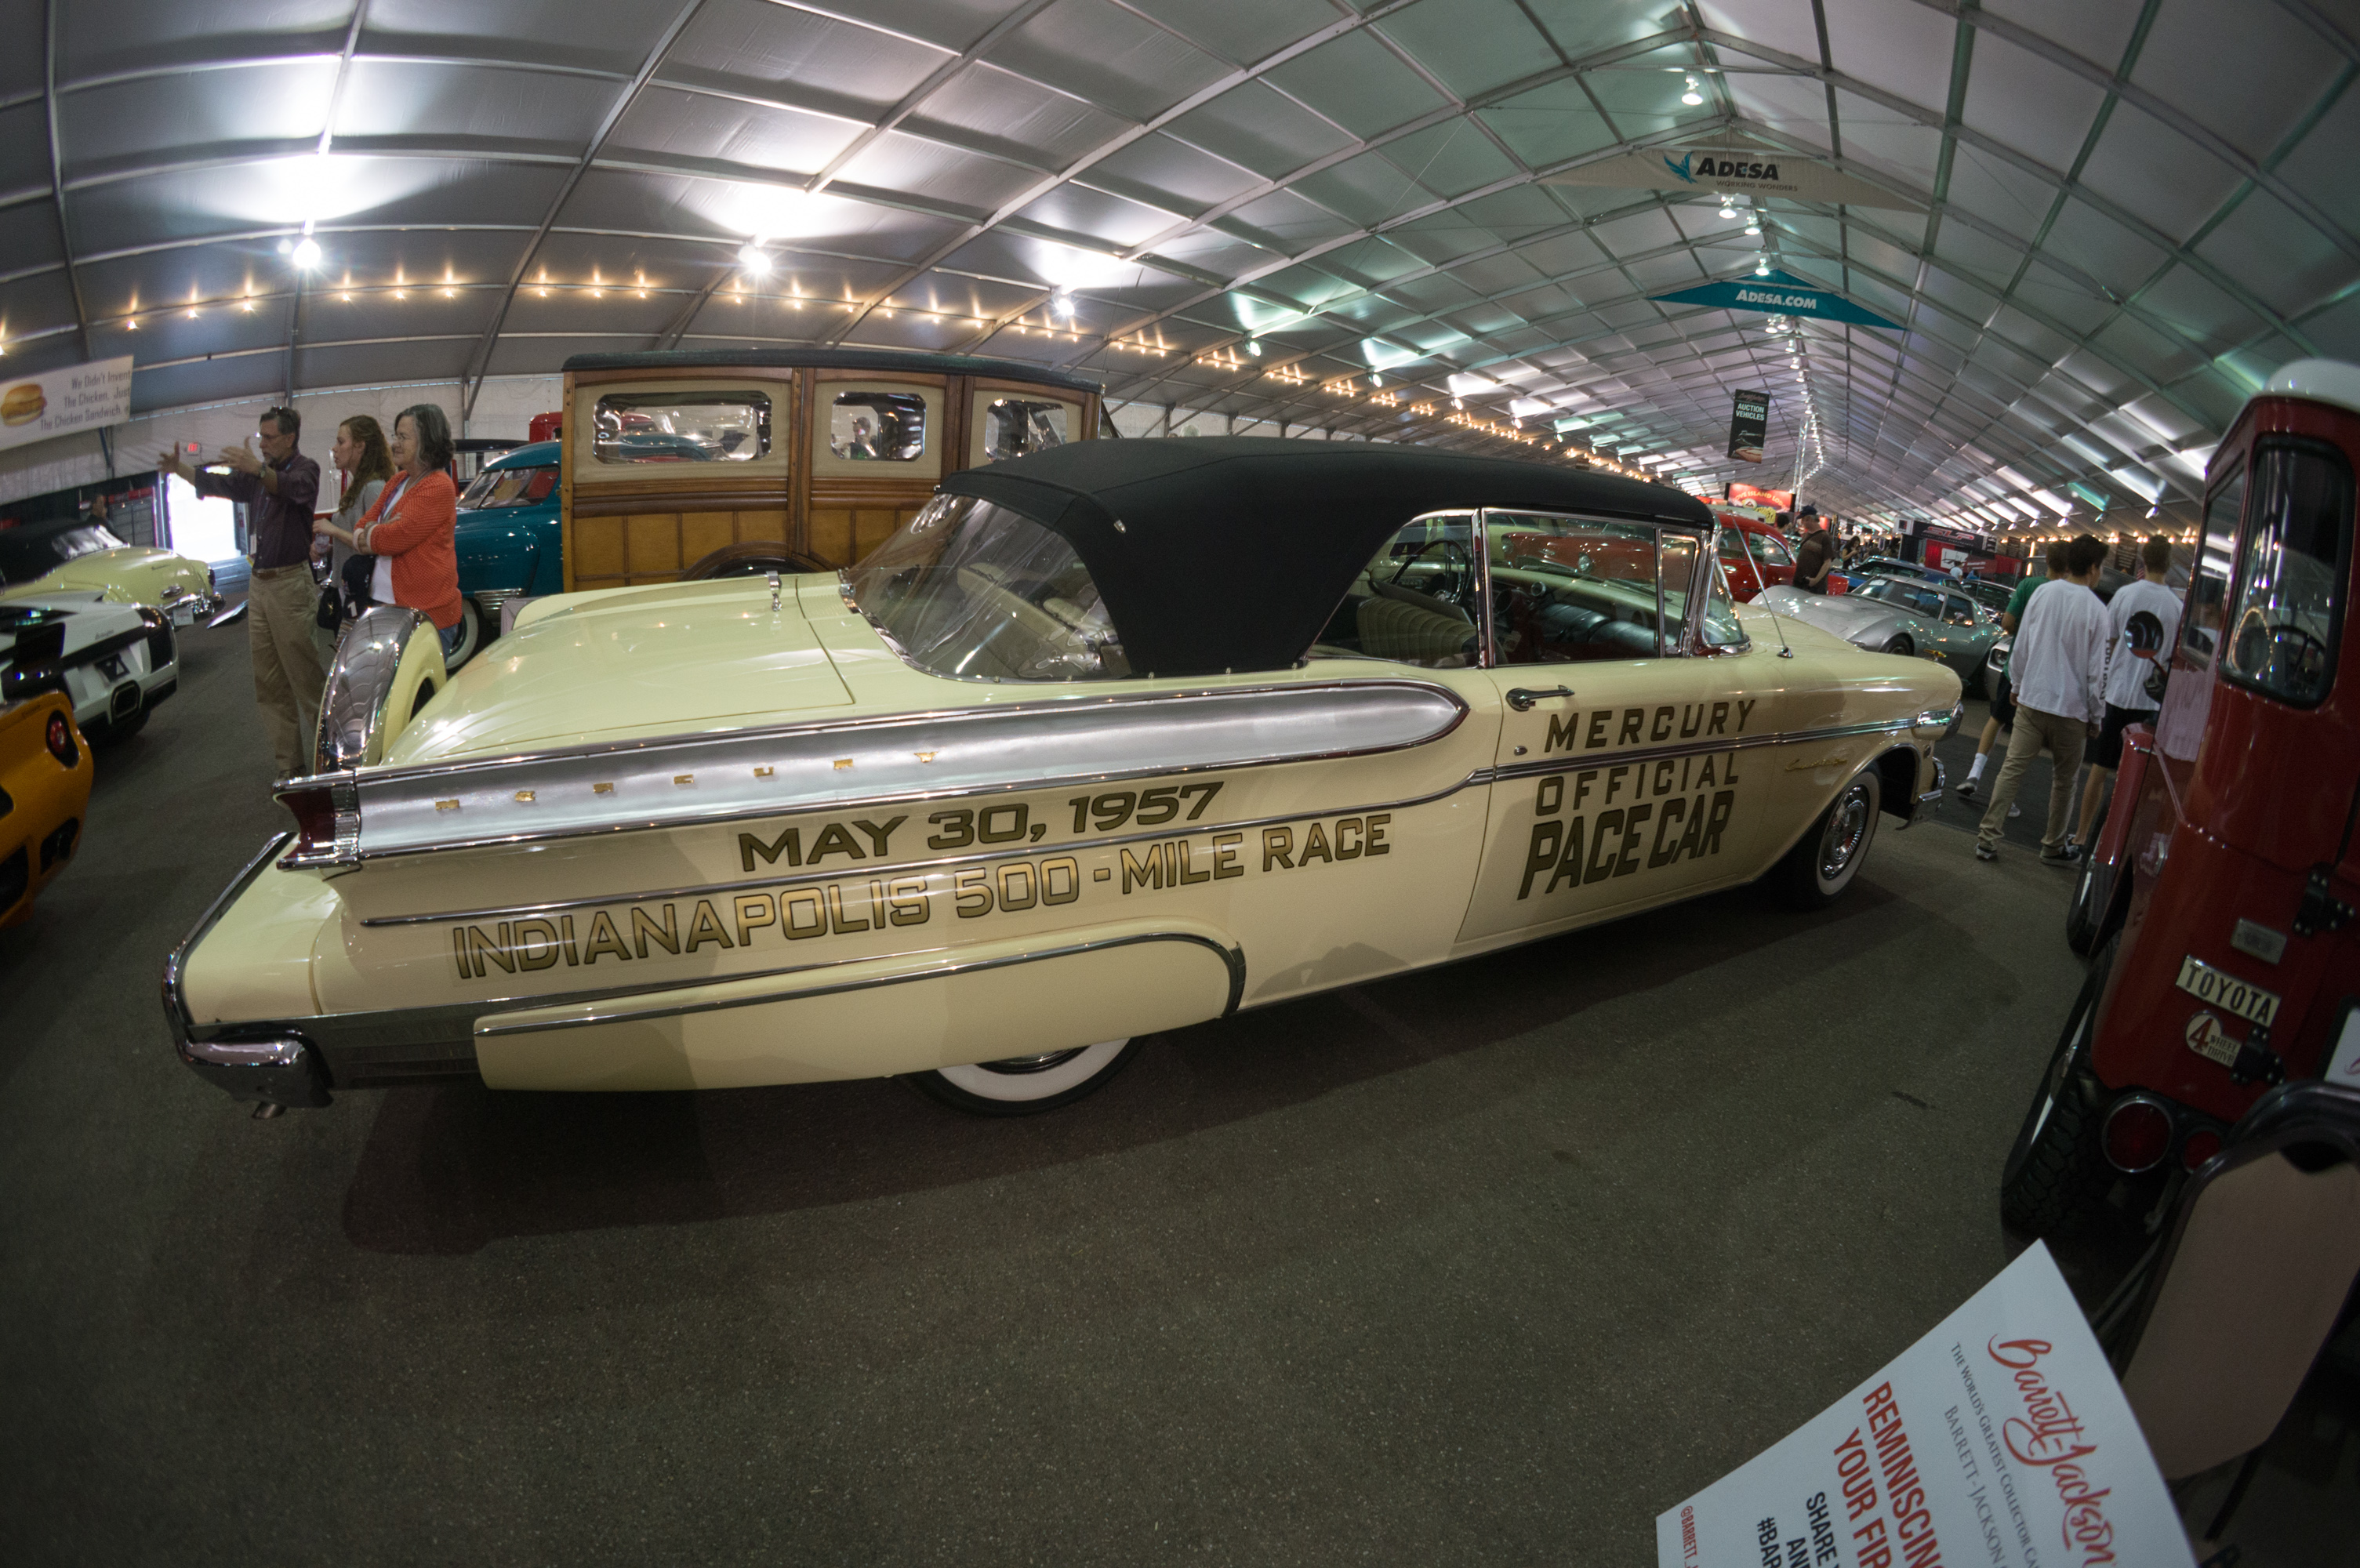 1957 mercury turnpike cruiser pace car convertible - 1957 Mercury Turnpike Cruiser Indianapolis Pace Car